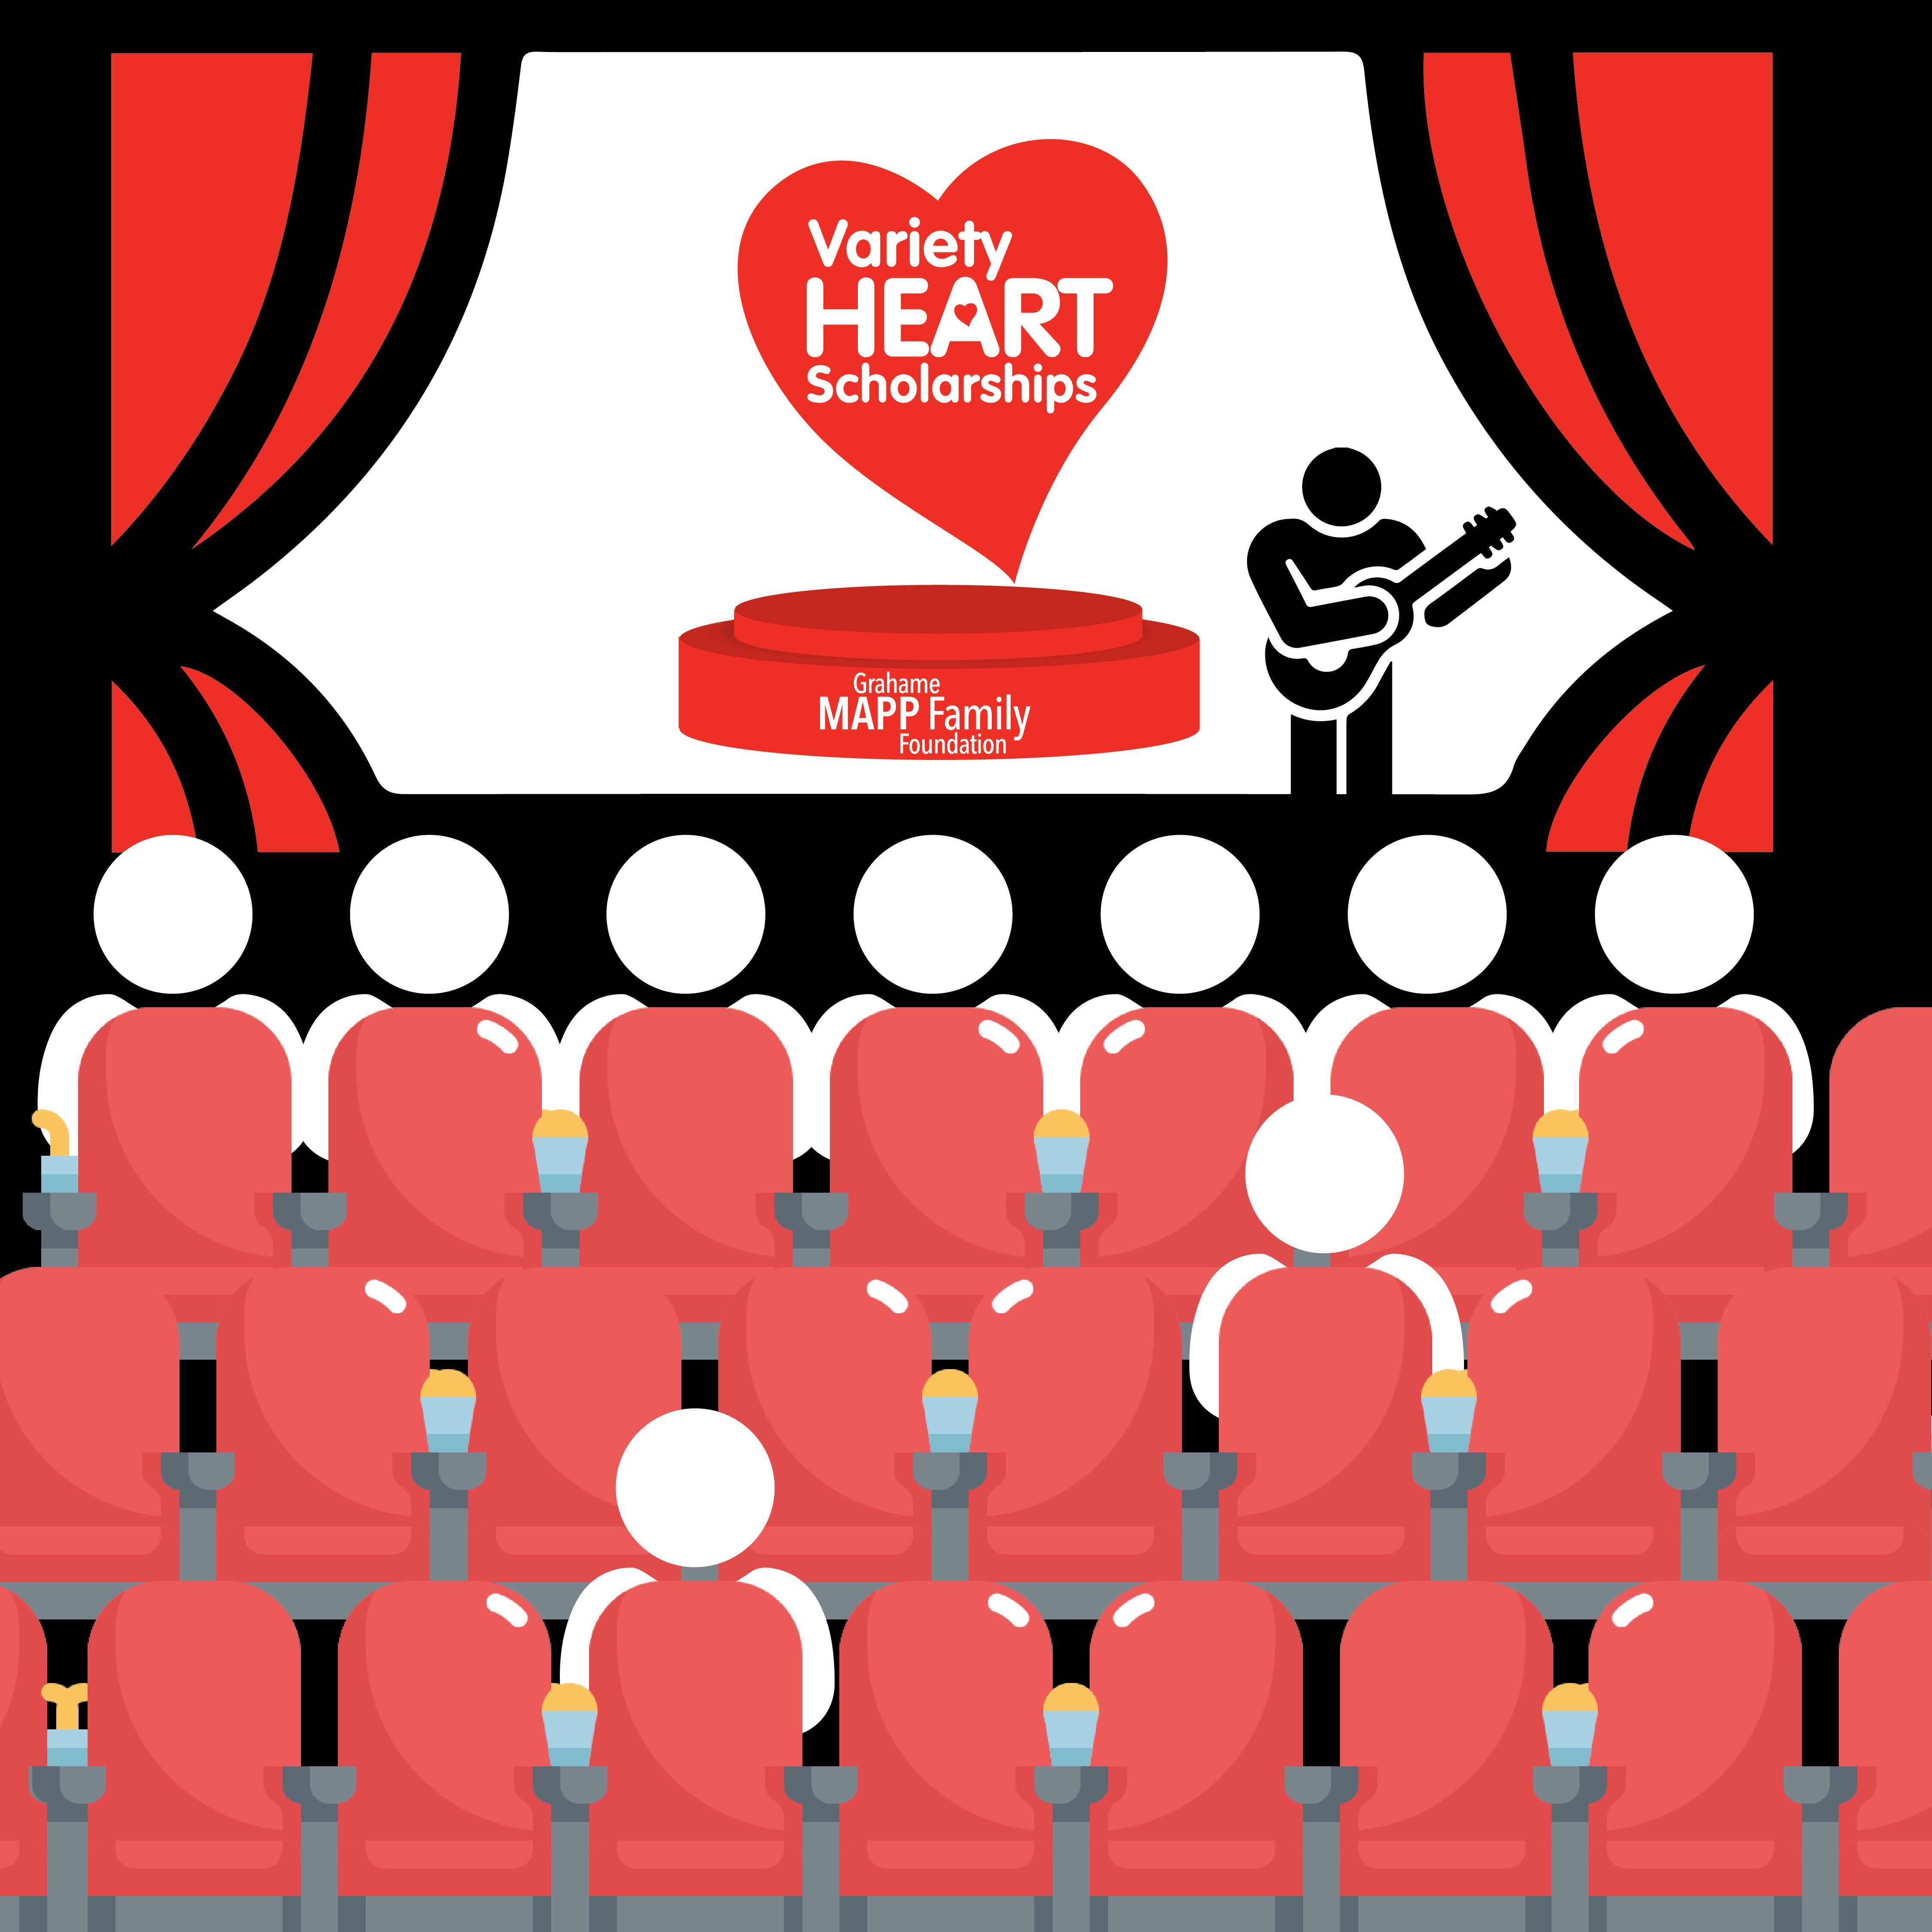 Variety Heart Scholarships theatre 1